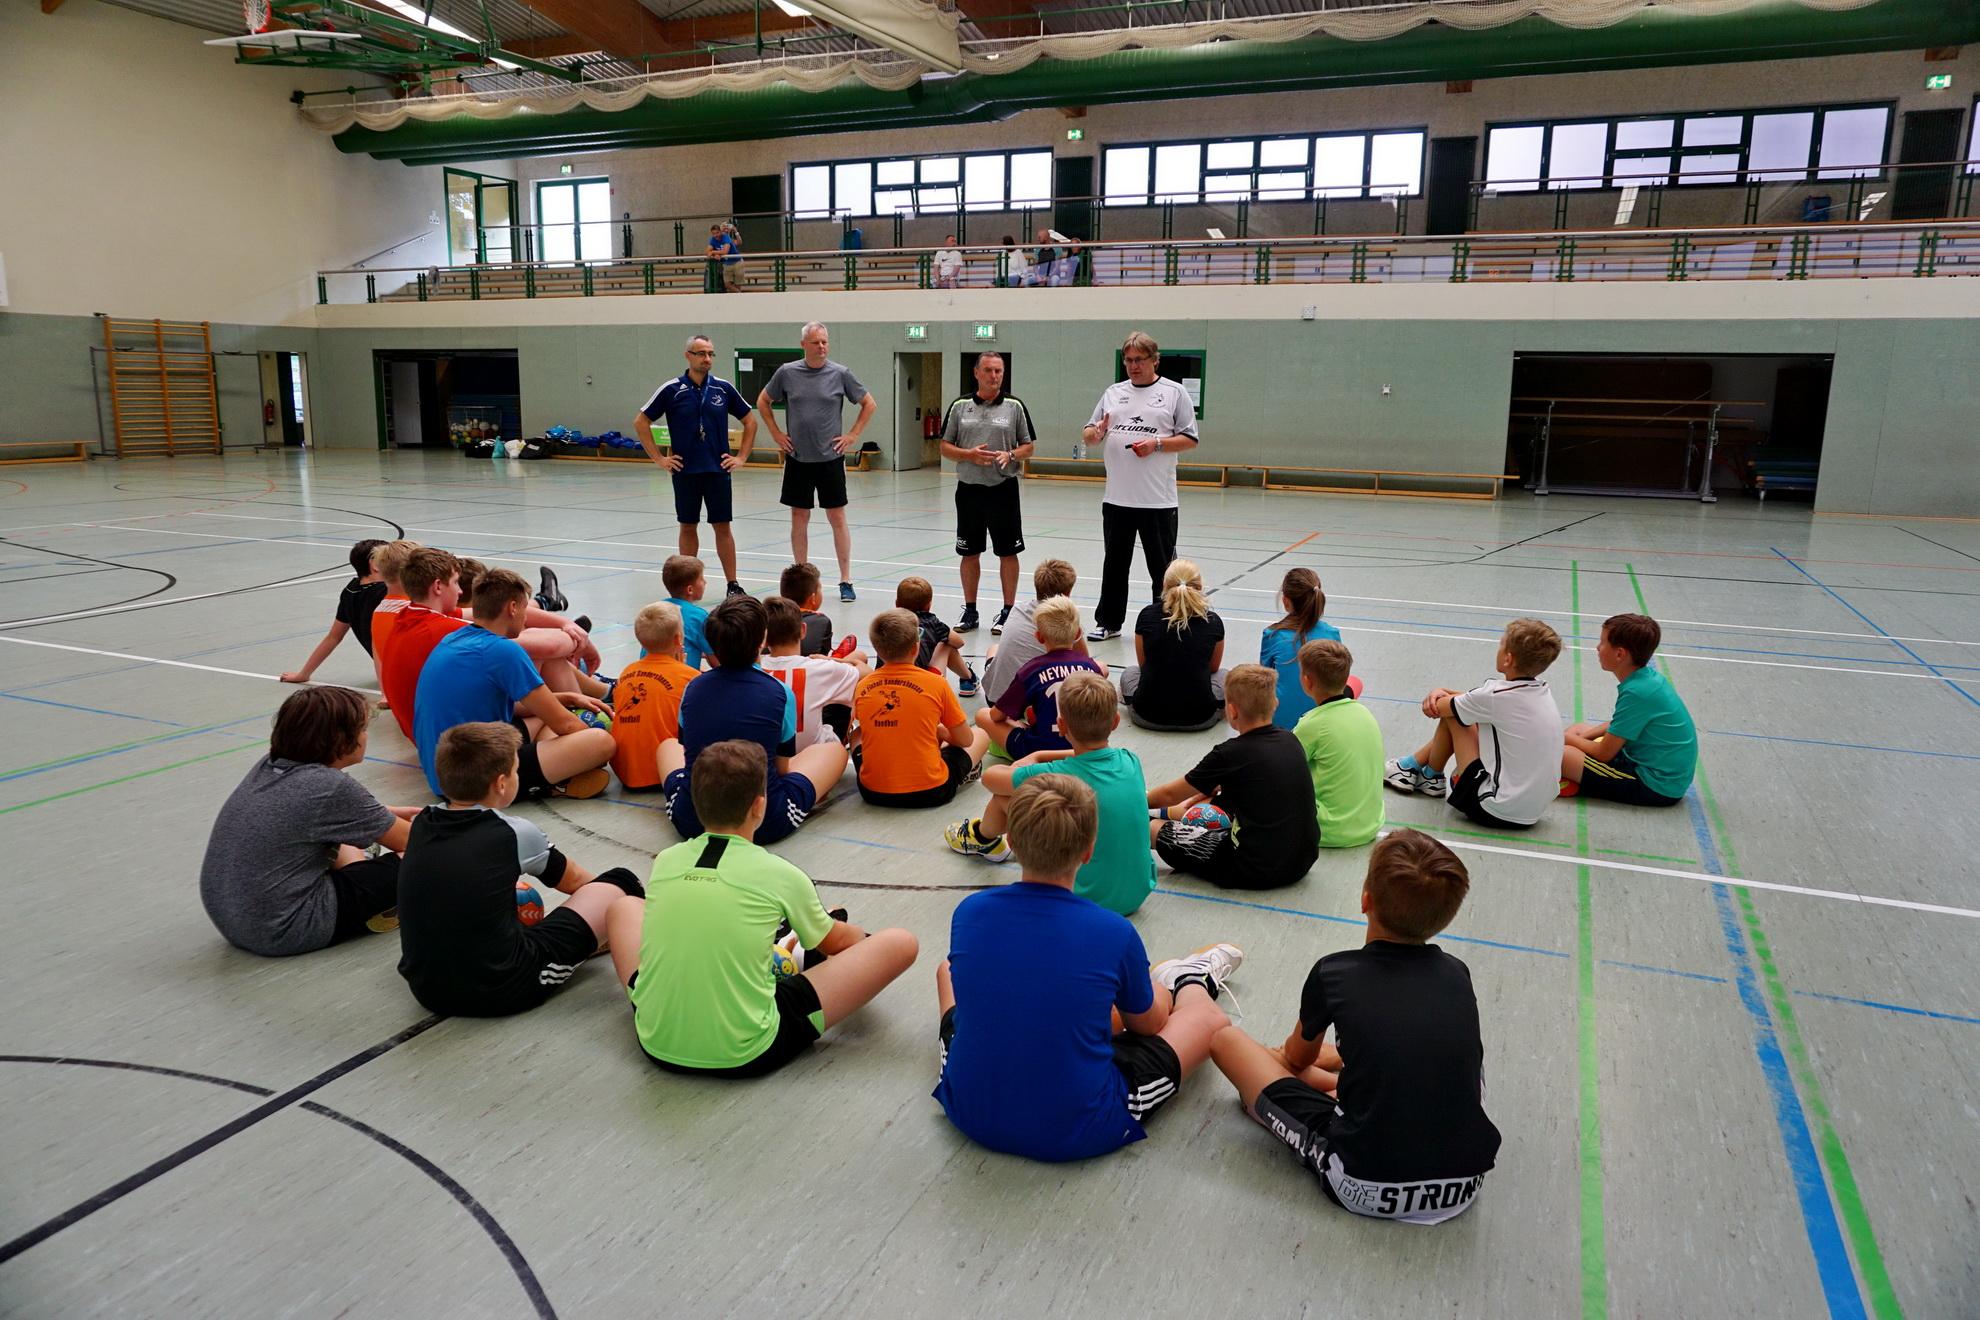 201808_Handballcamp_SDH_MG_007w